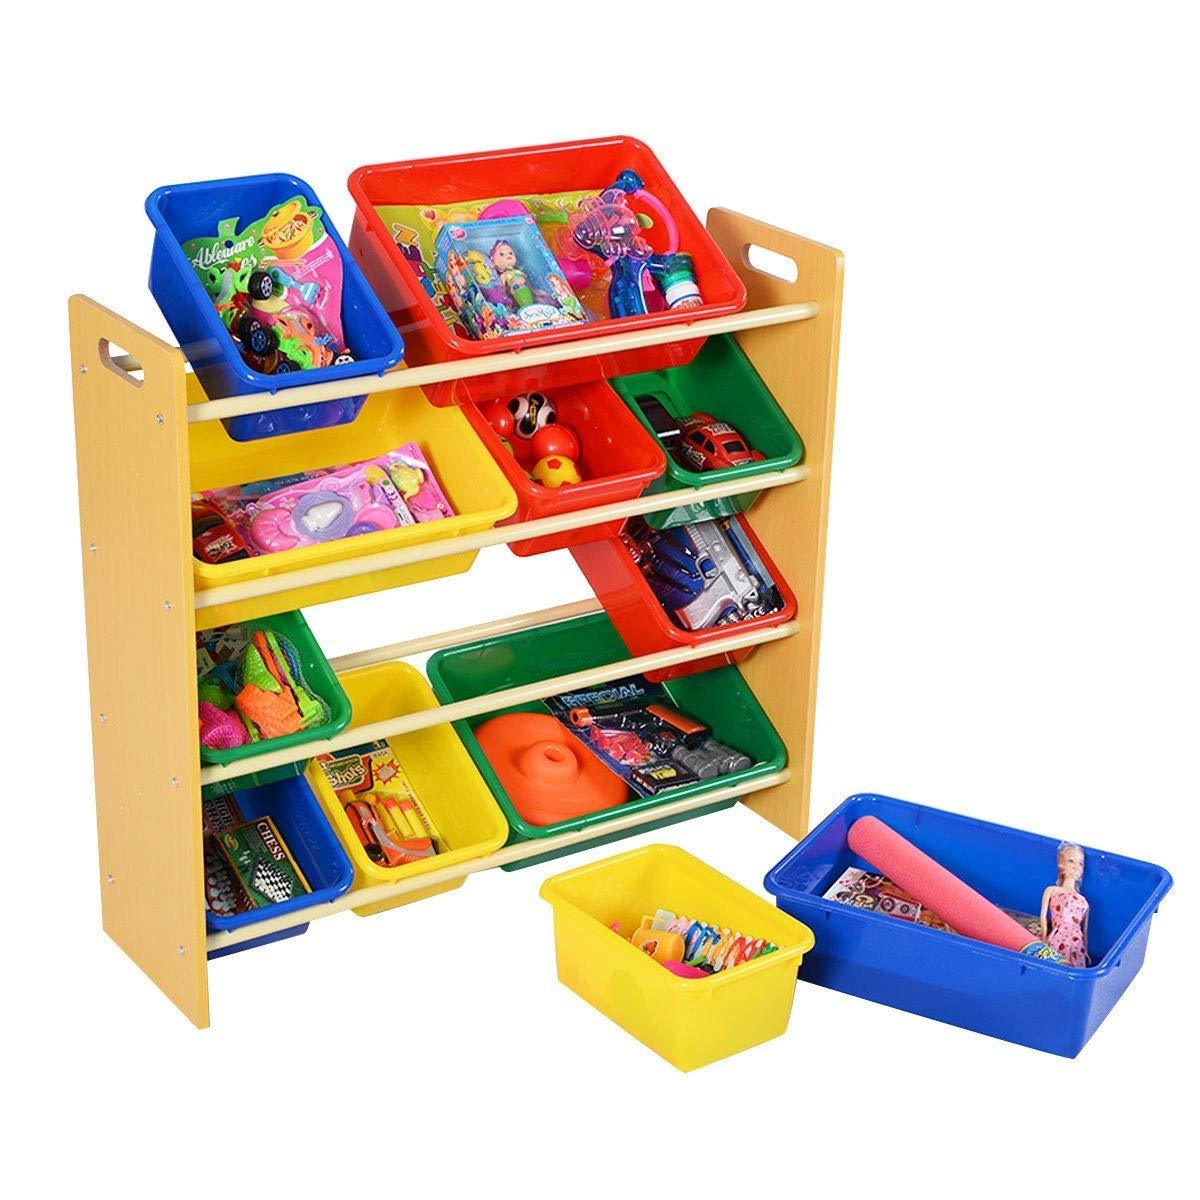 MRT SUPPLY Toy Bins Organizer Storage Box with Ebook